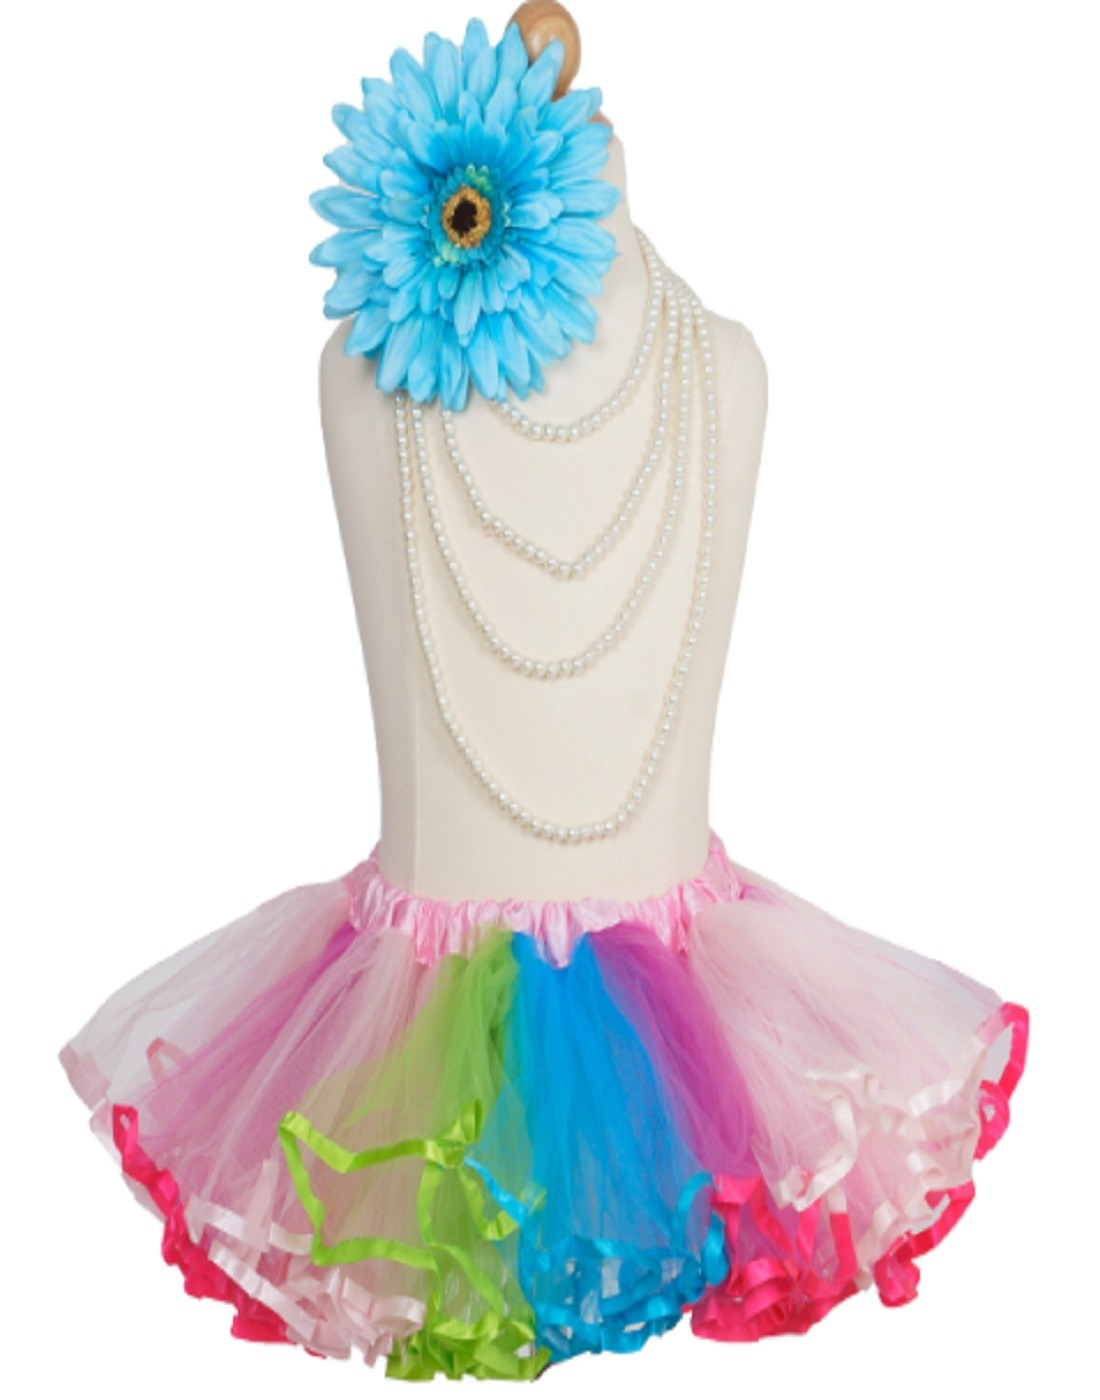 75c2d4909 4 Layered Rainbow Girls Ballet Tutu Skirt for Dance Performance ...